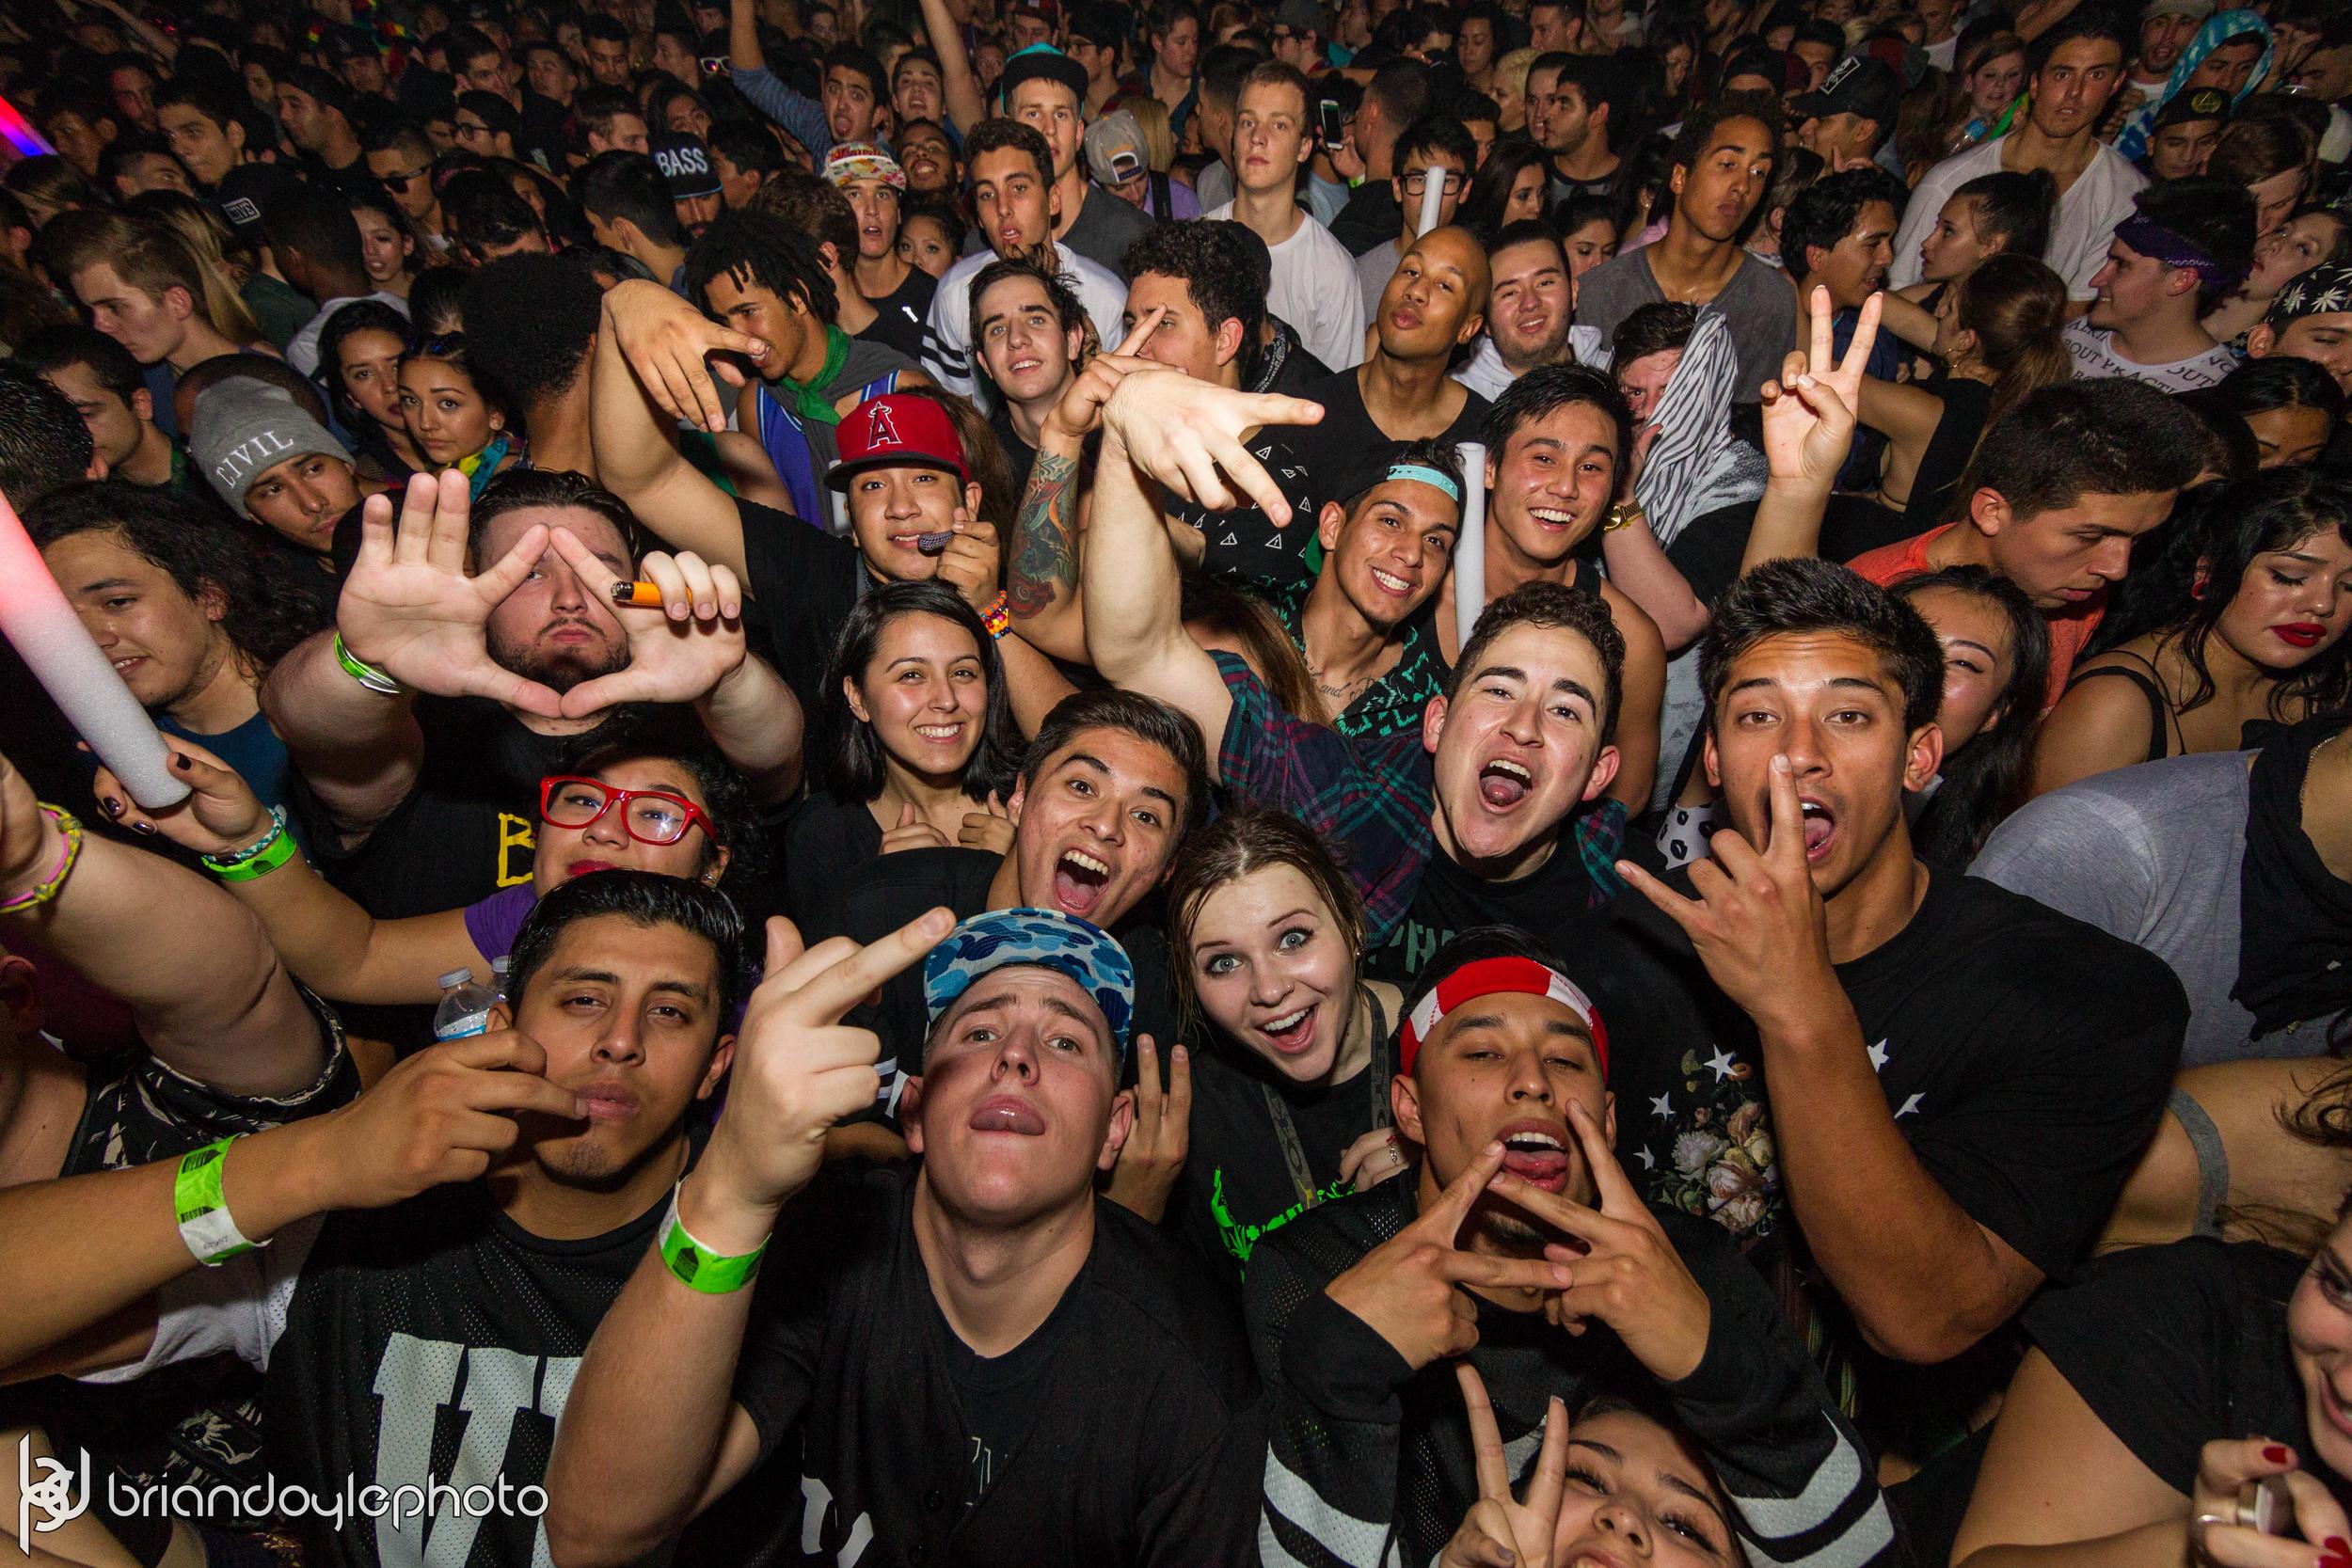 OMFG NYE 2015 LA - Flosstradamus, GTA, Branchez, Curtis Williams and Two 9 2014.12.29 -27.jpg